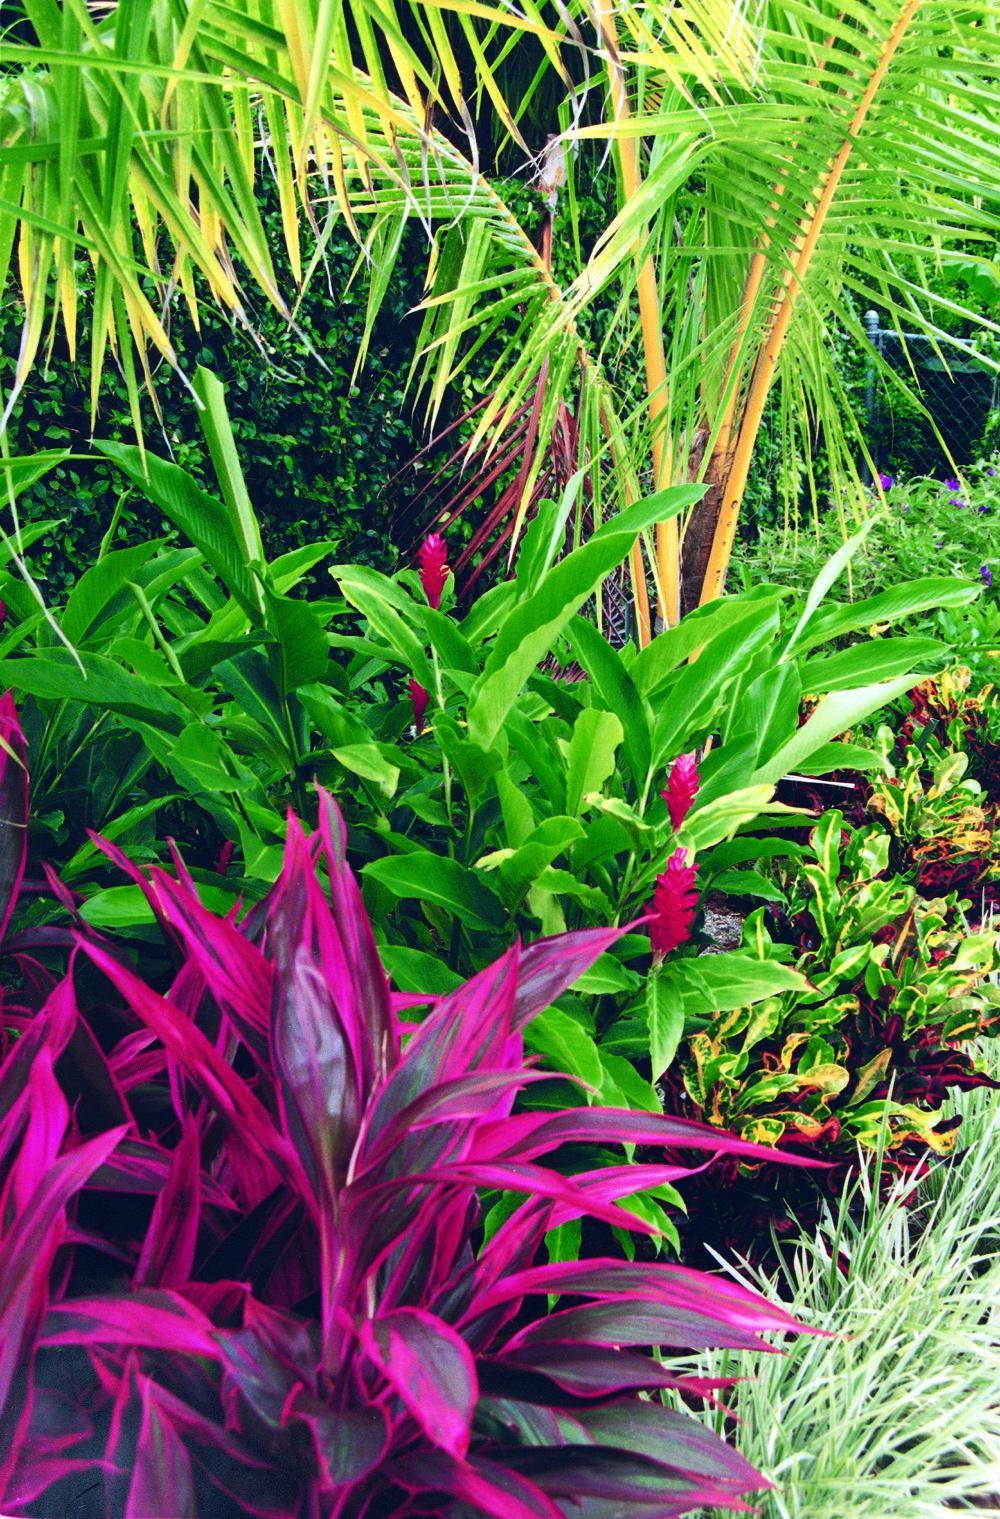 1 000 1 519 pixels for Jardin tropical plantas